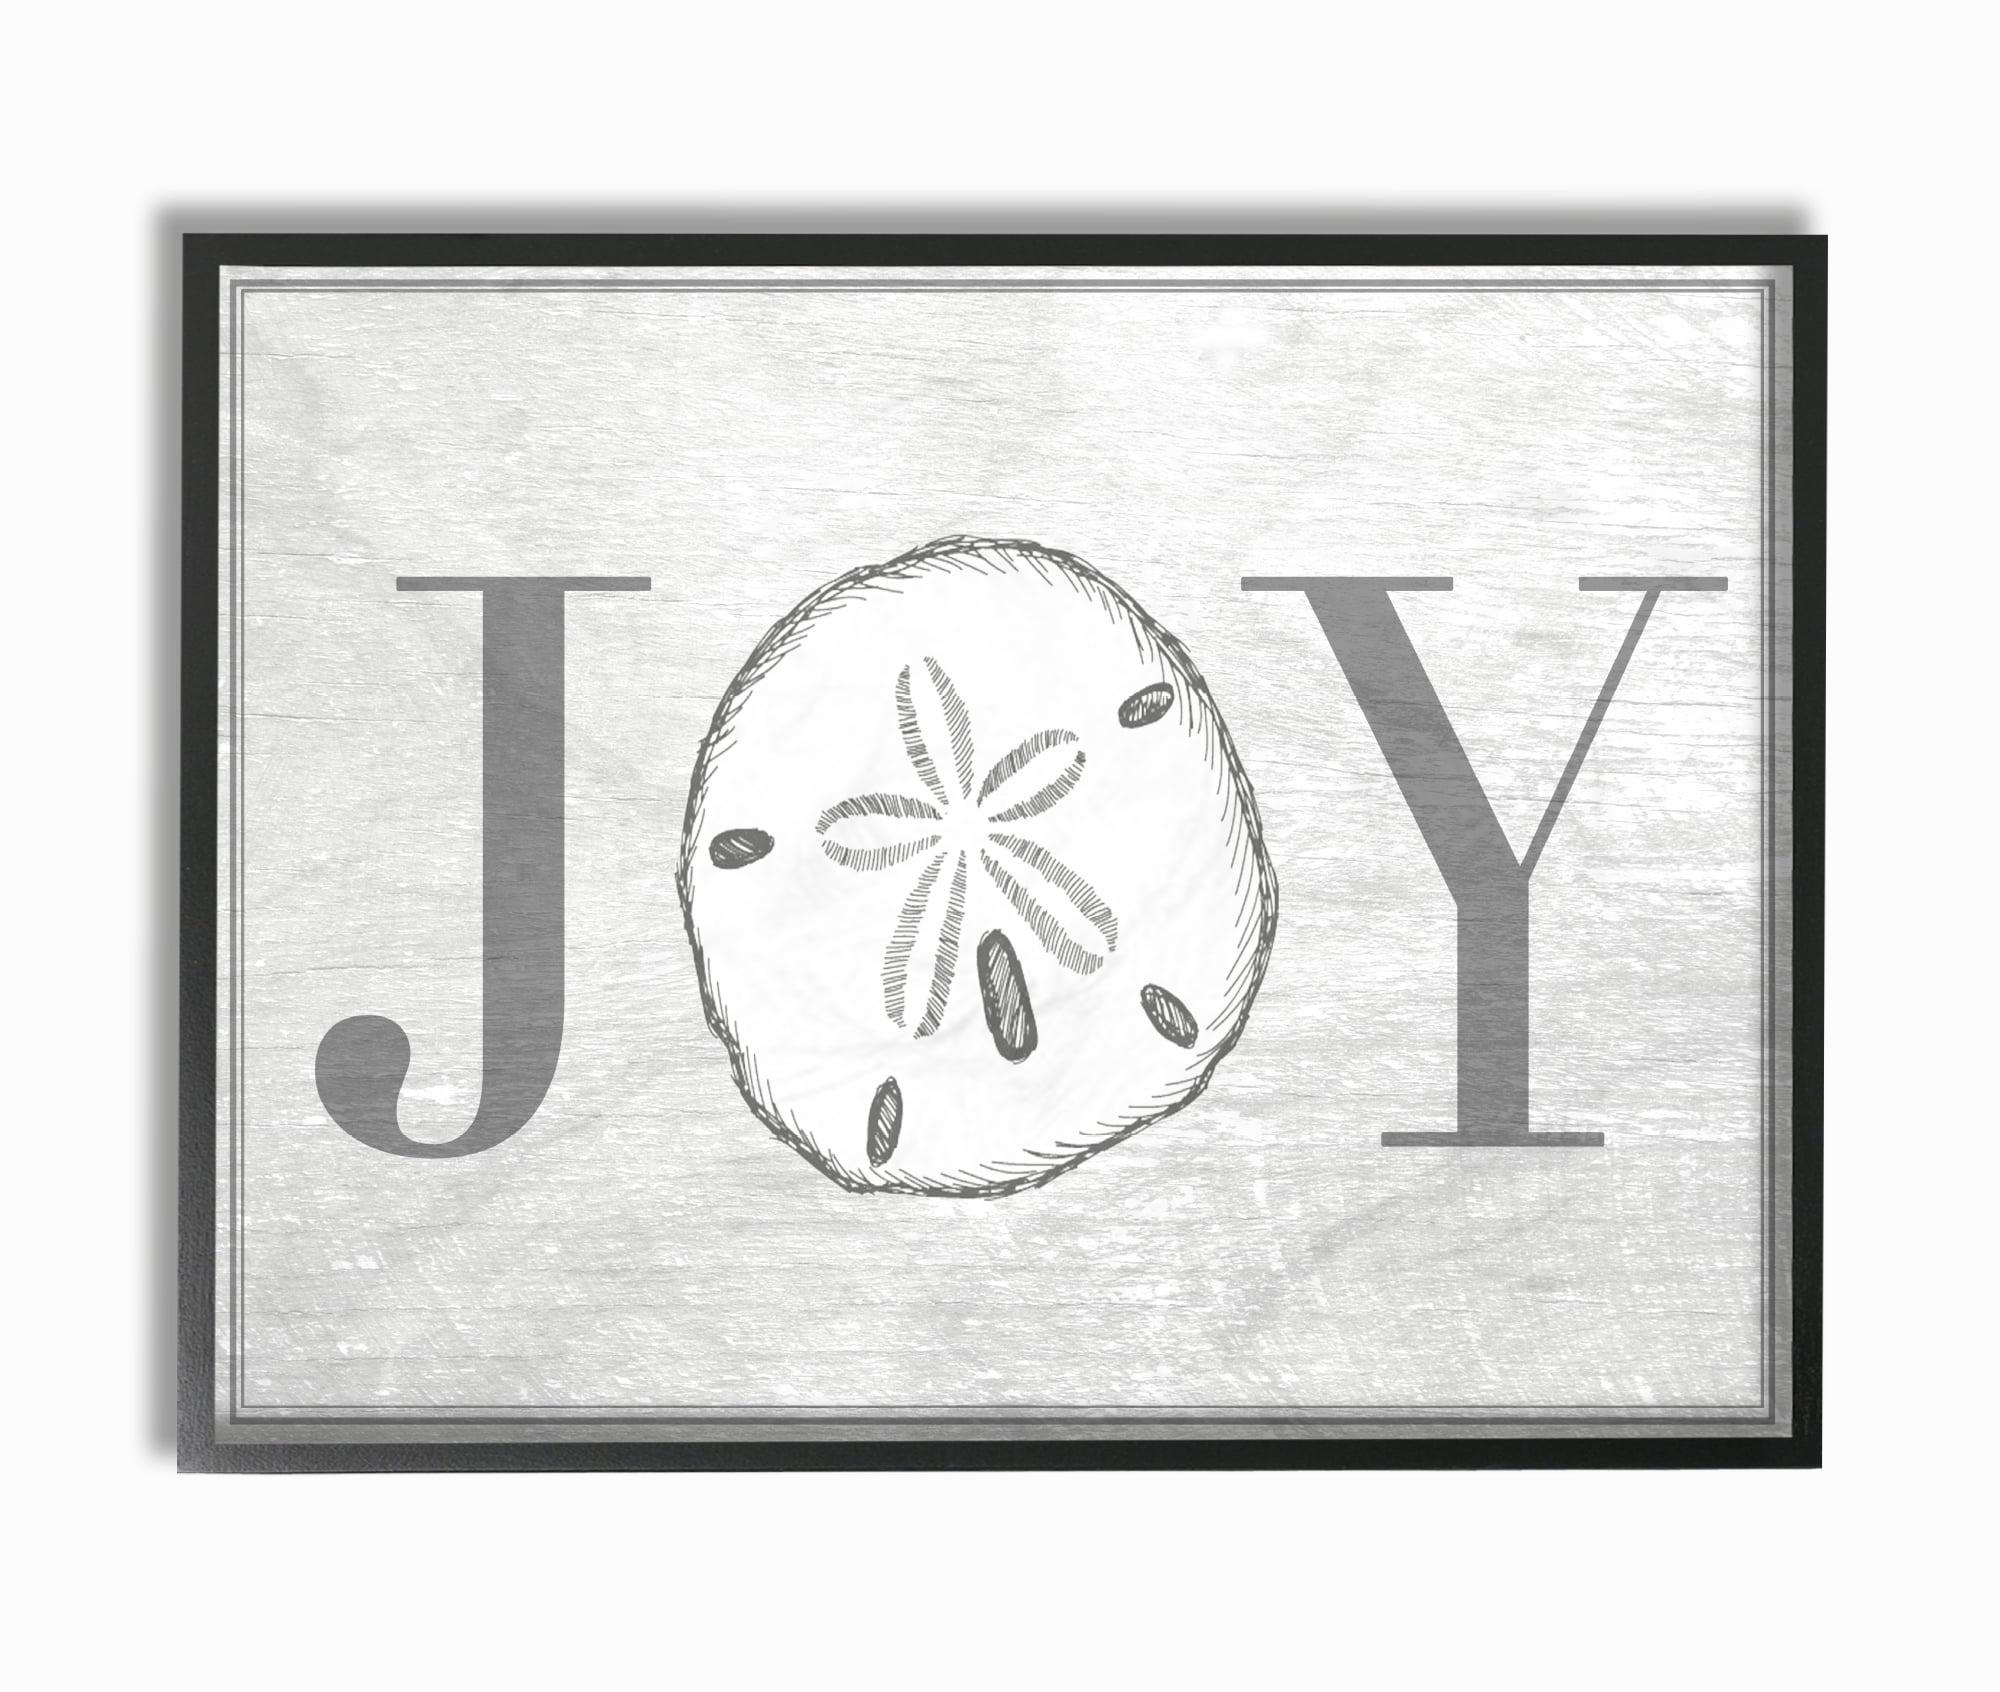 The Stupell Home Decor Collection Joyful Summer Sand Dollar Framed Giclee Texturized Art,... by Stupell Industries